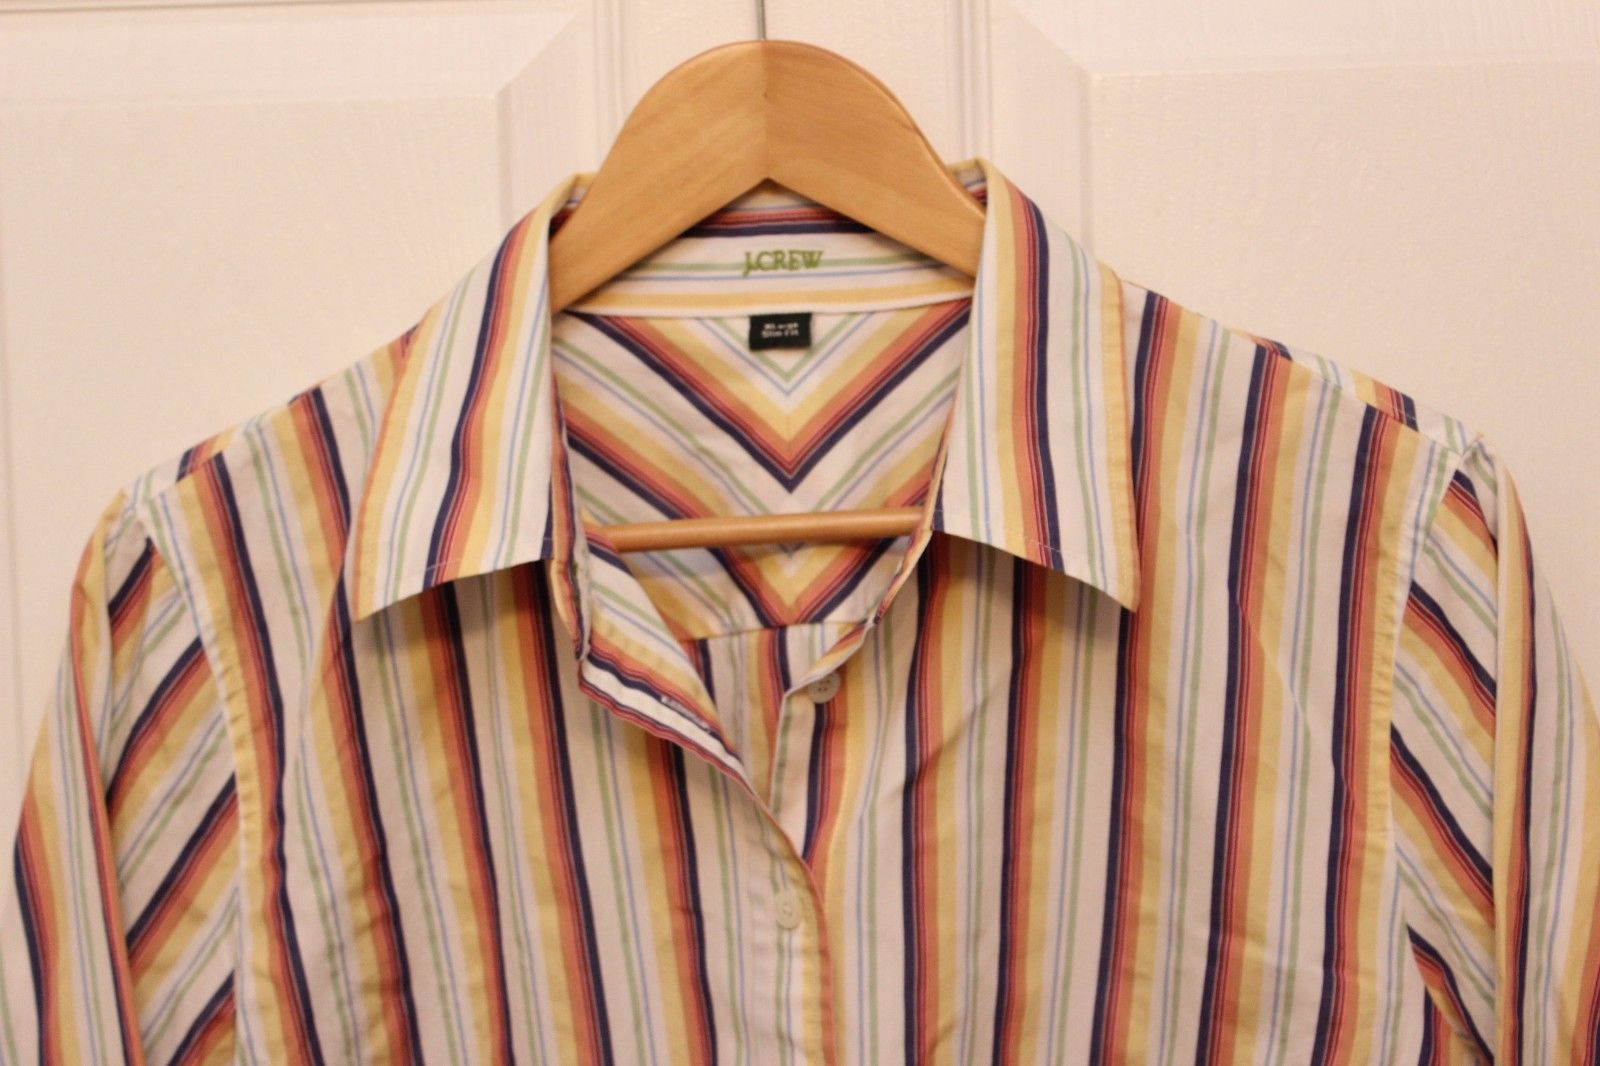 JCREW Shirt SLIM FIT Womens XL Button Down Blouse ROYGB Striped Cotton